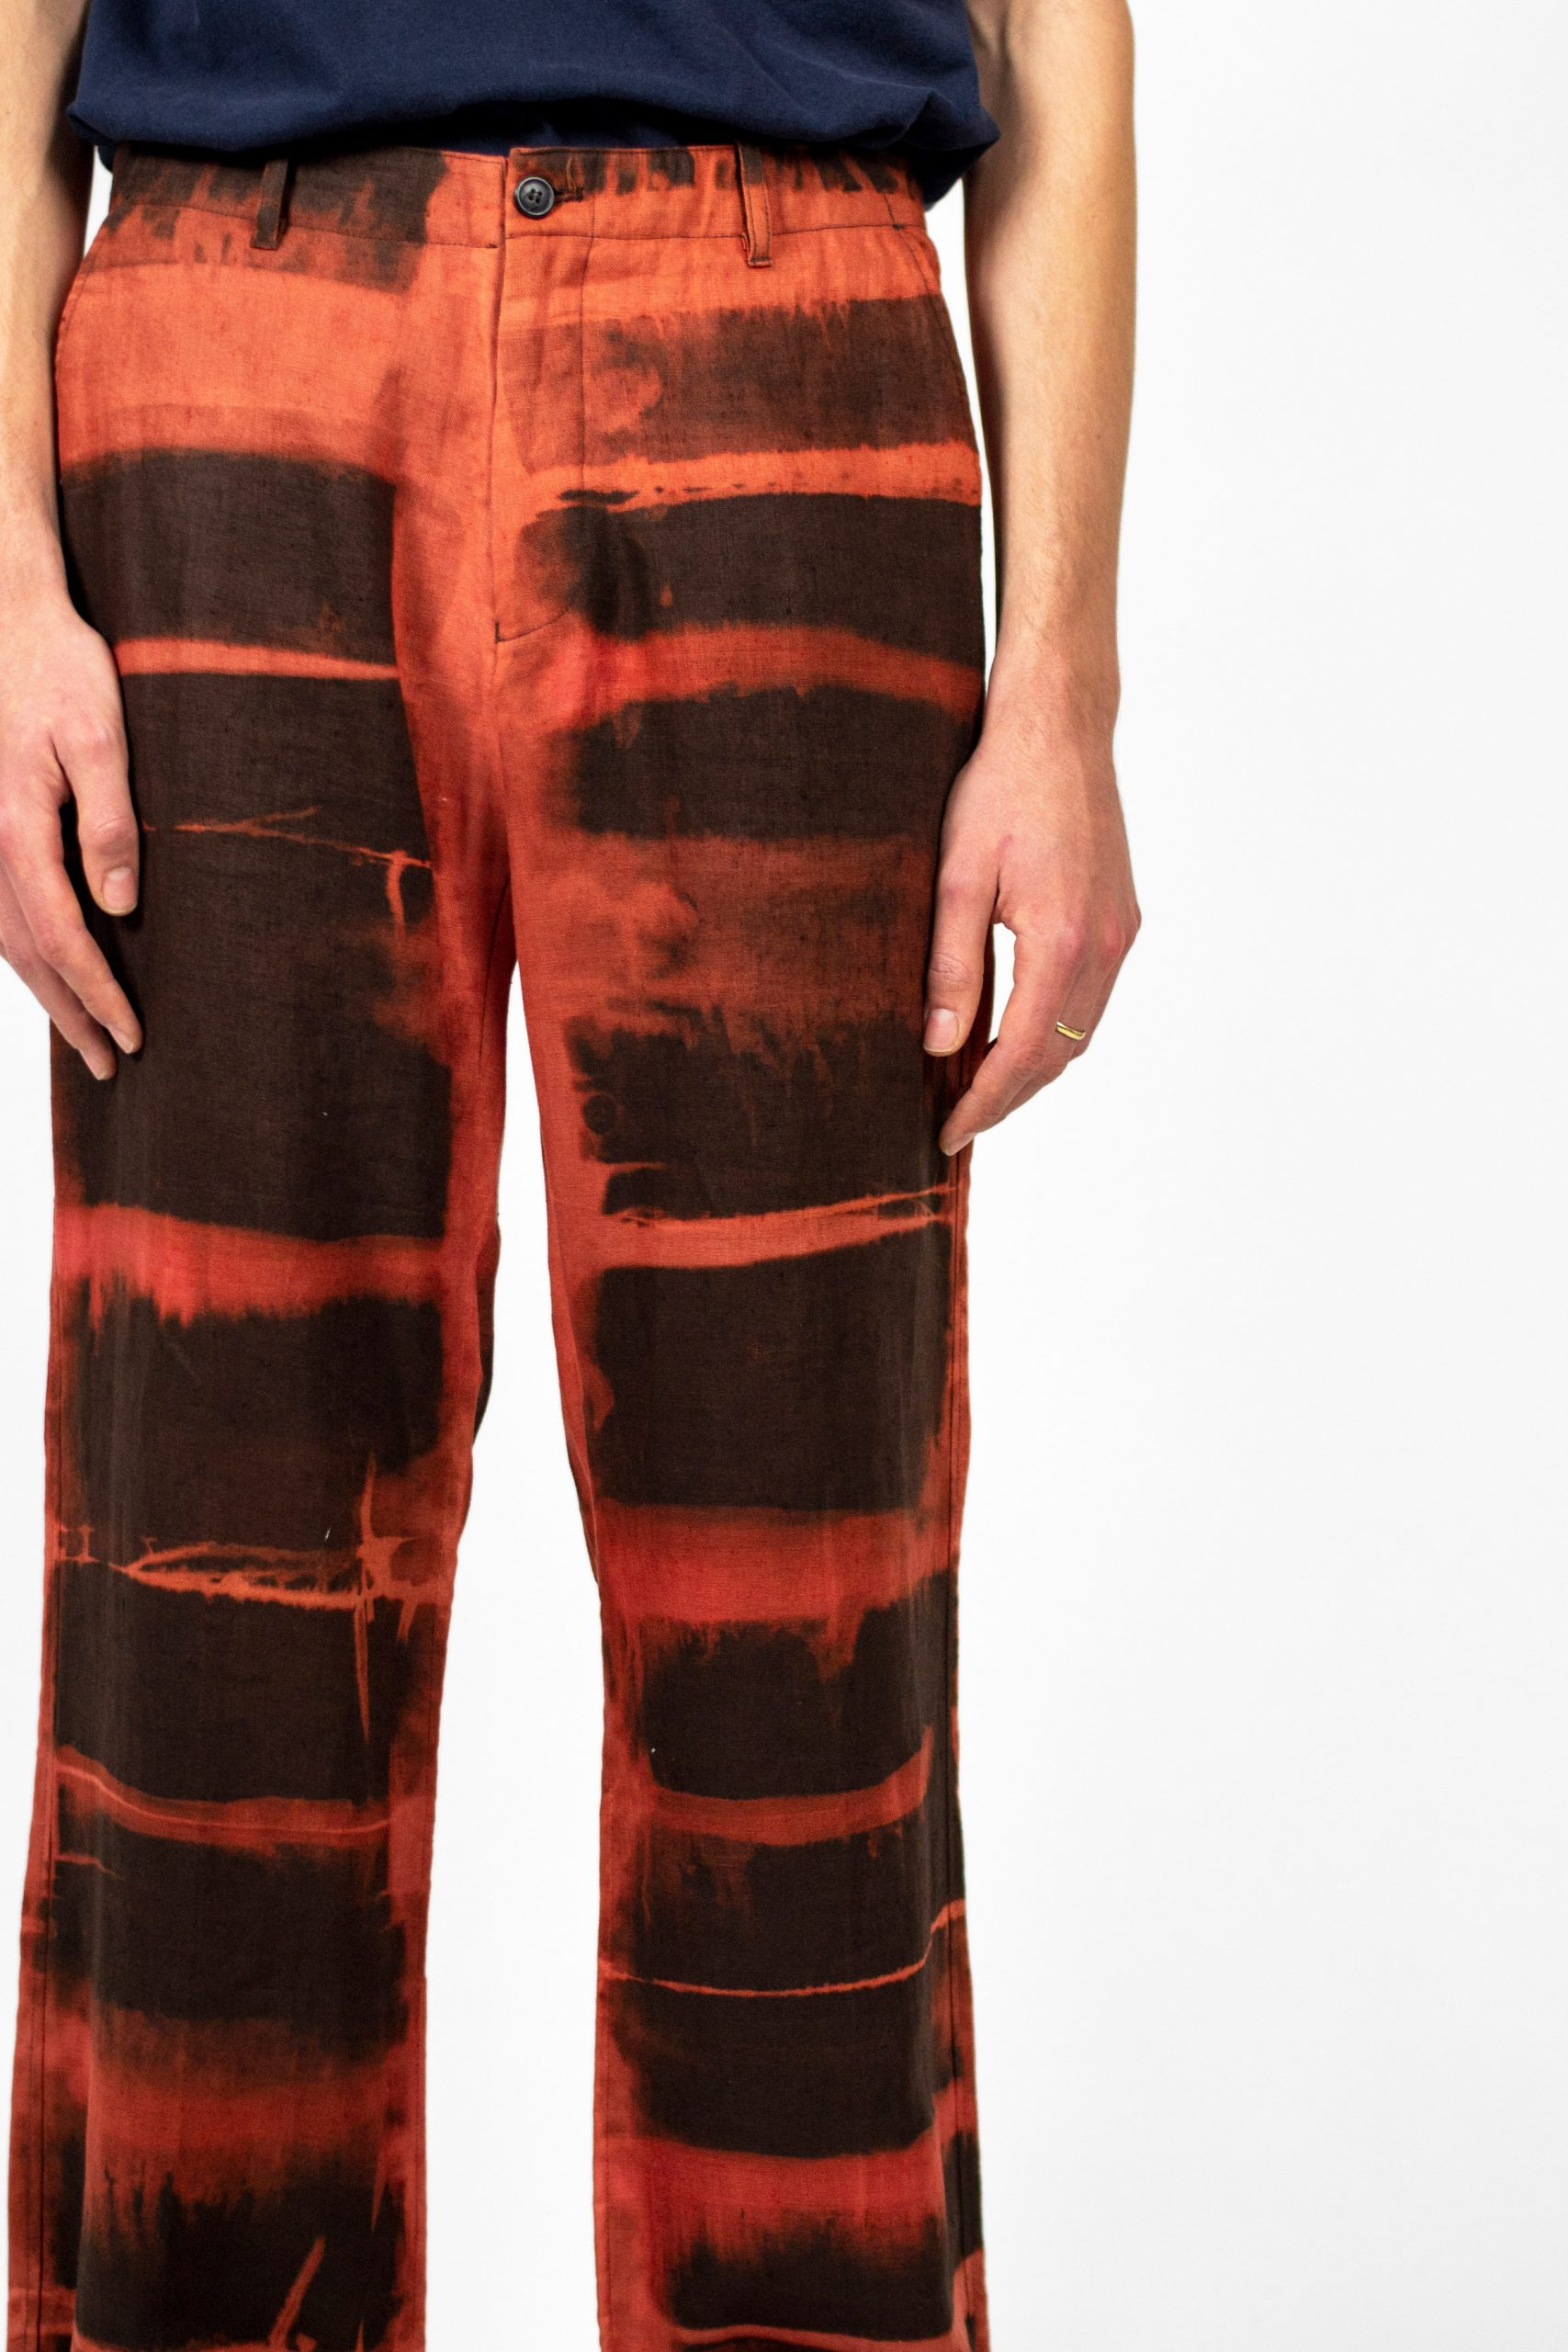 Shibori dyed trousers by Dave Hakkens